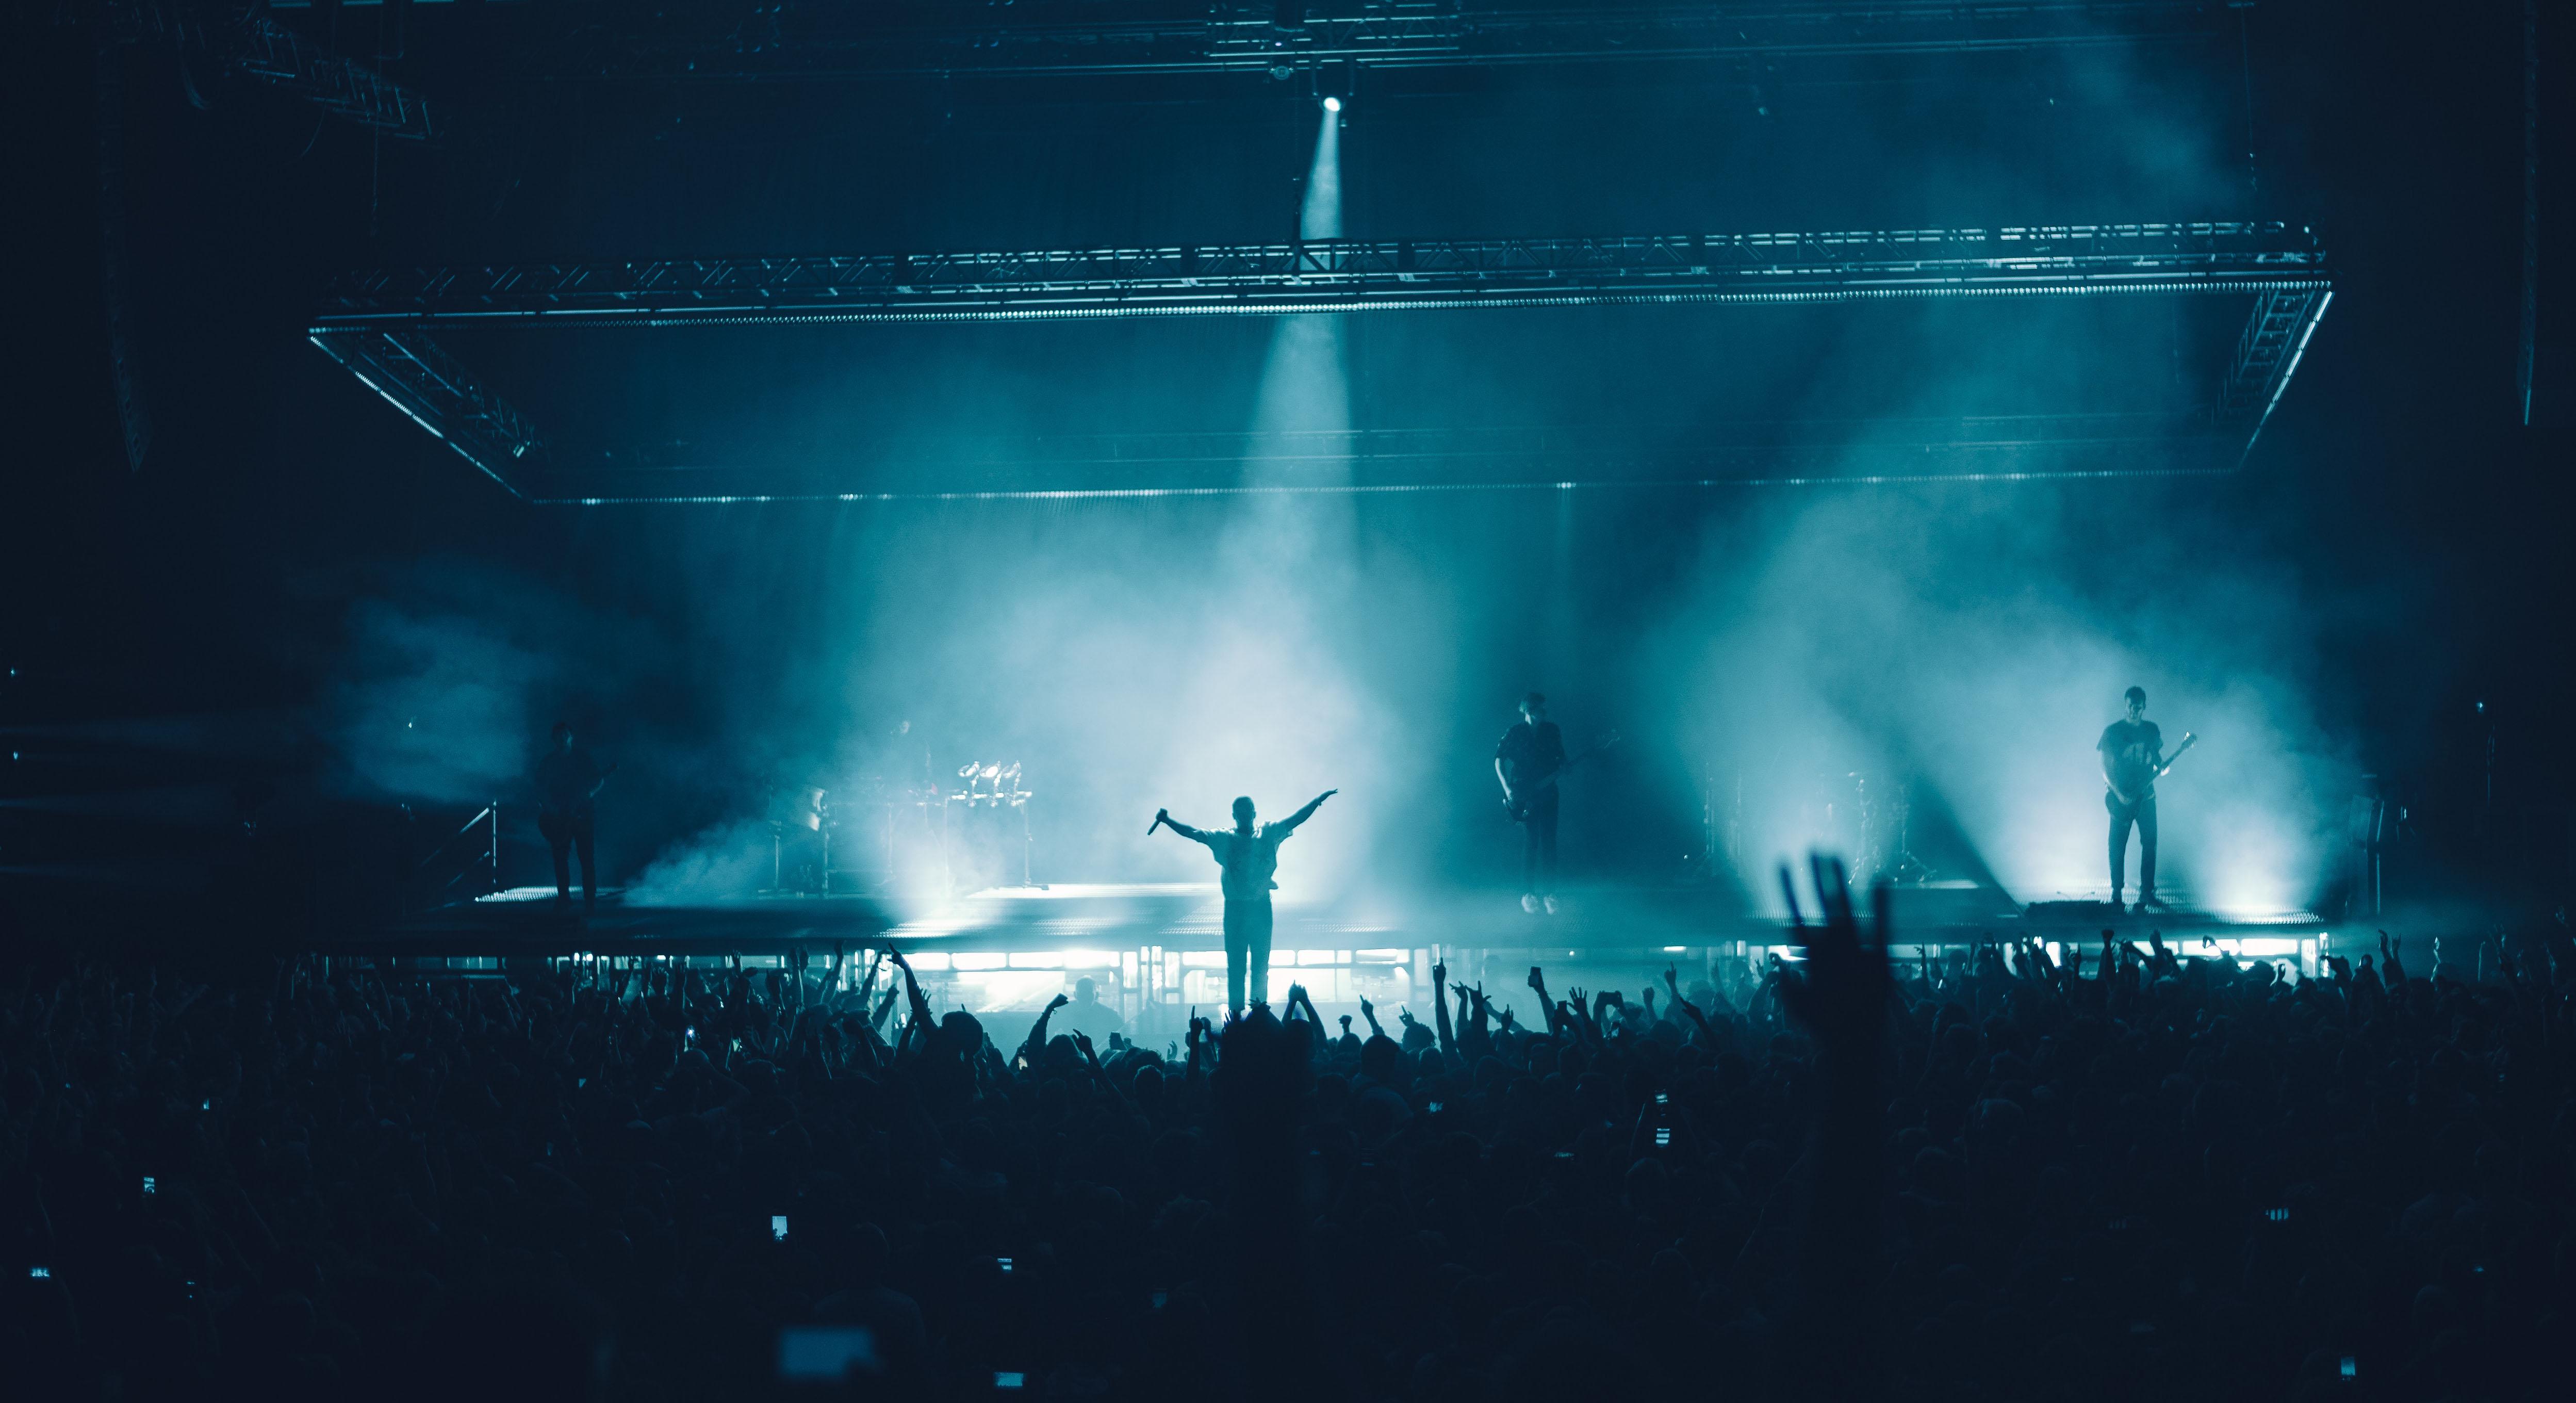 Vevo music video platform